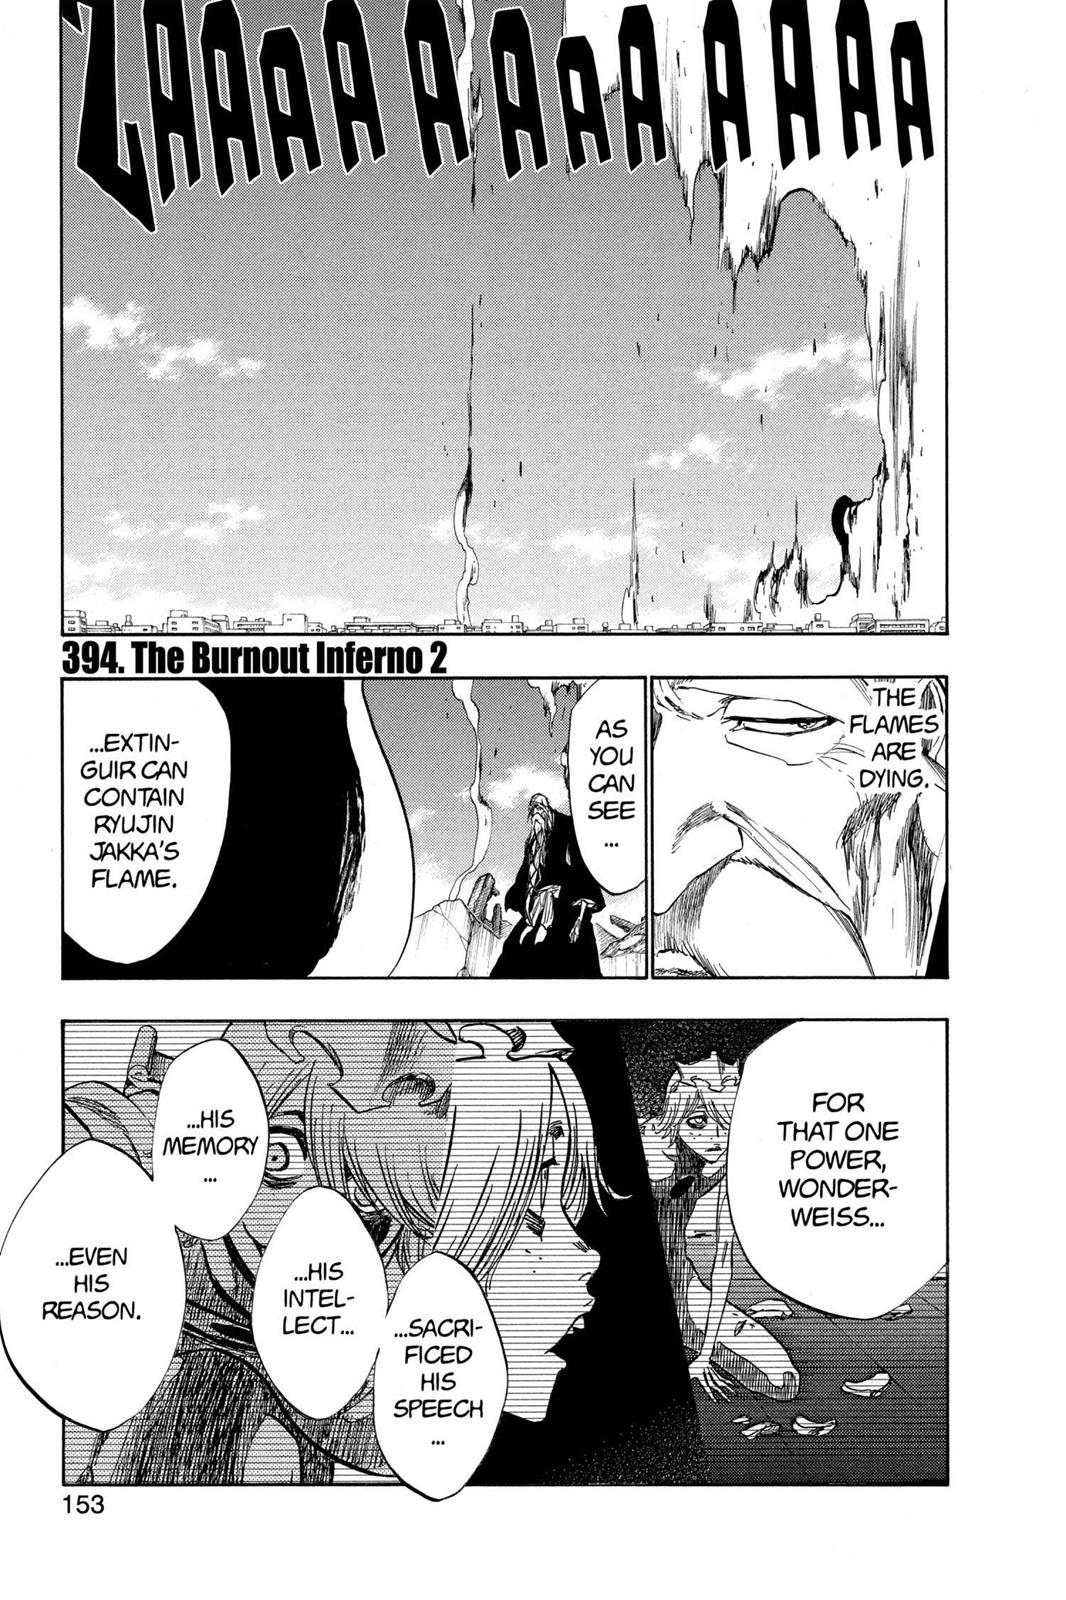 Bleach Chap 394 English Read Manga Online At Holymanga Net